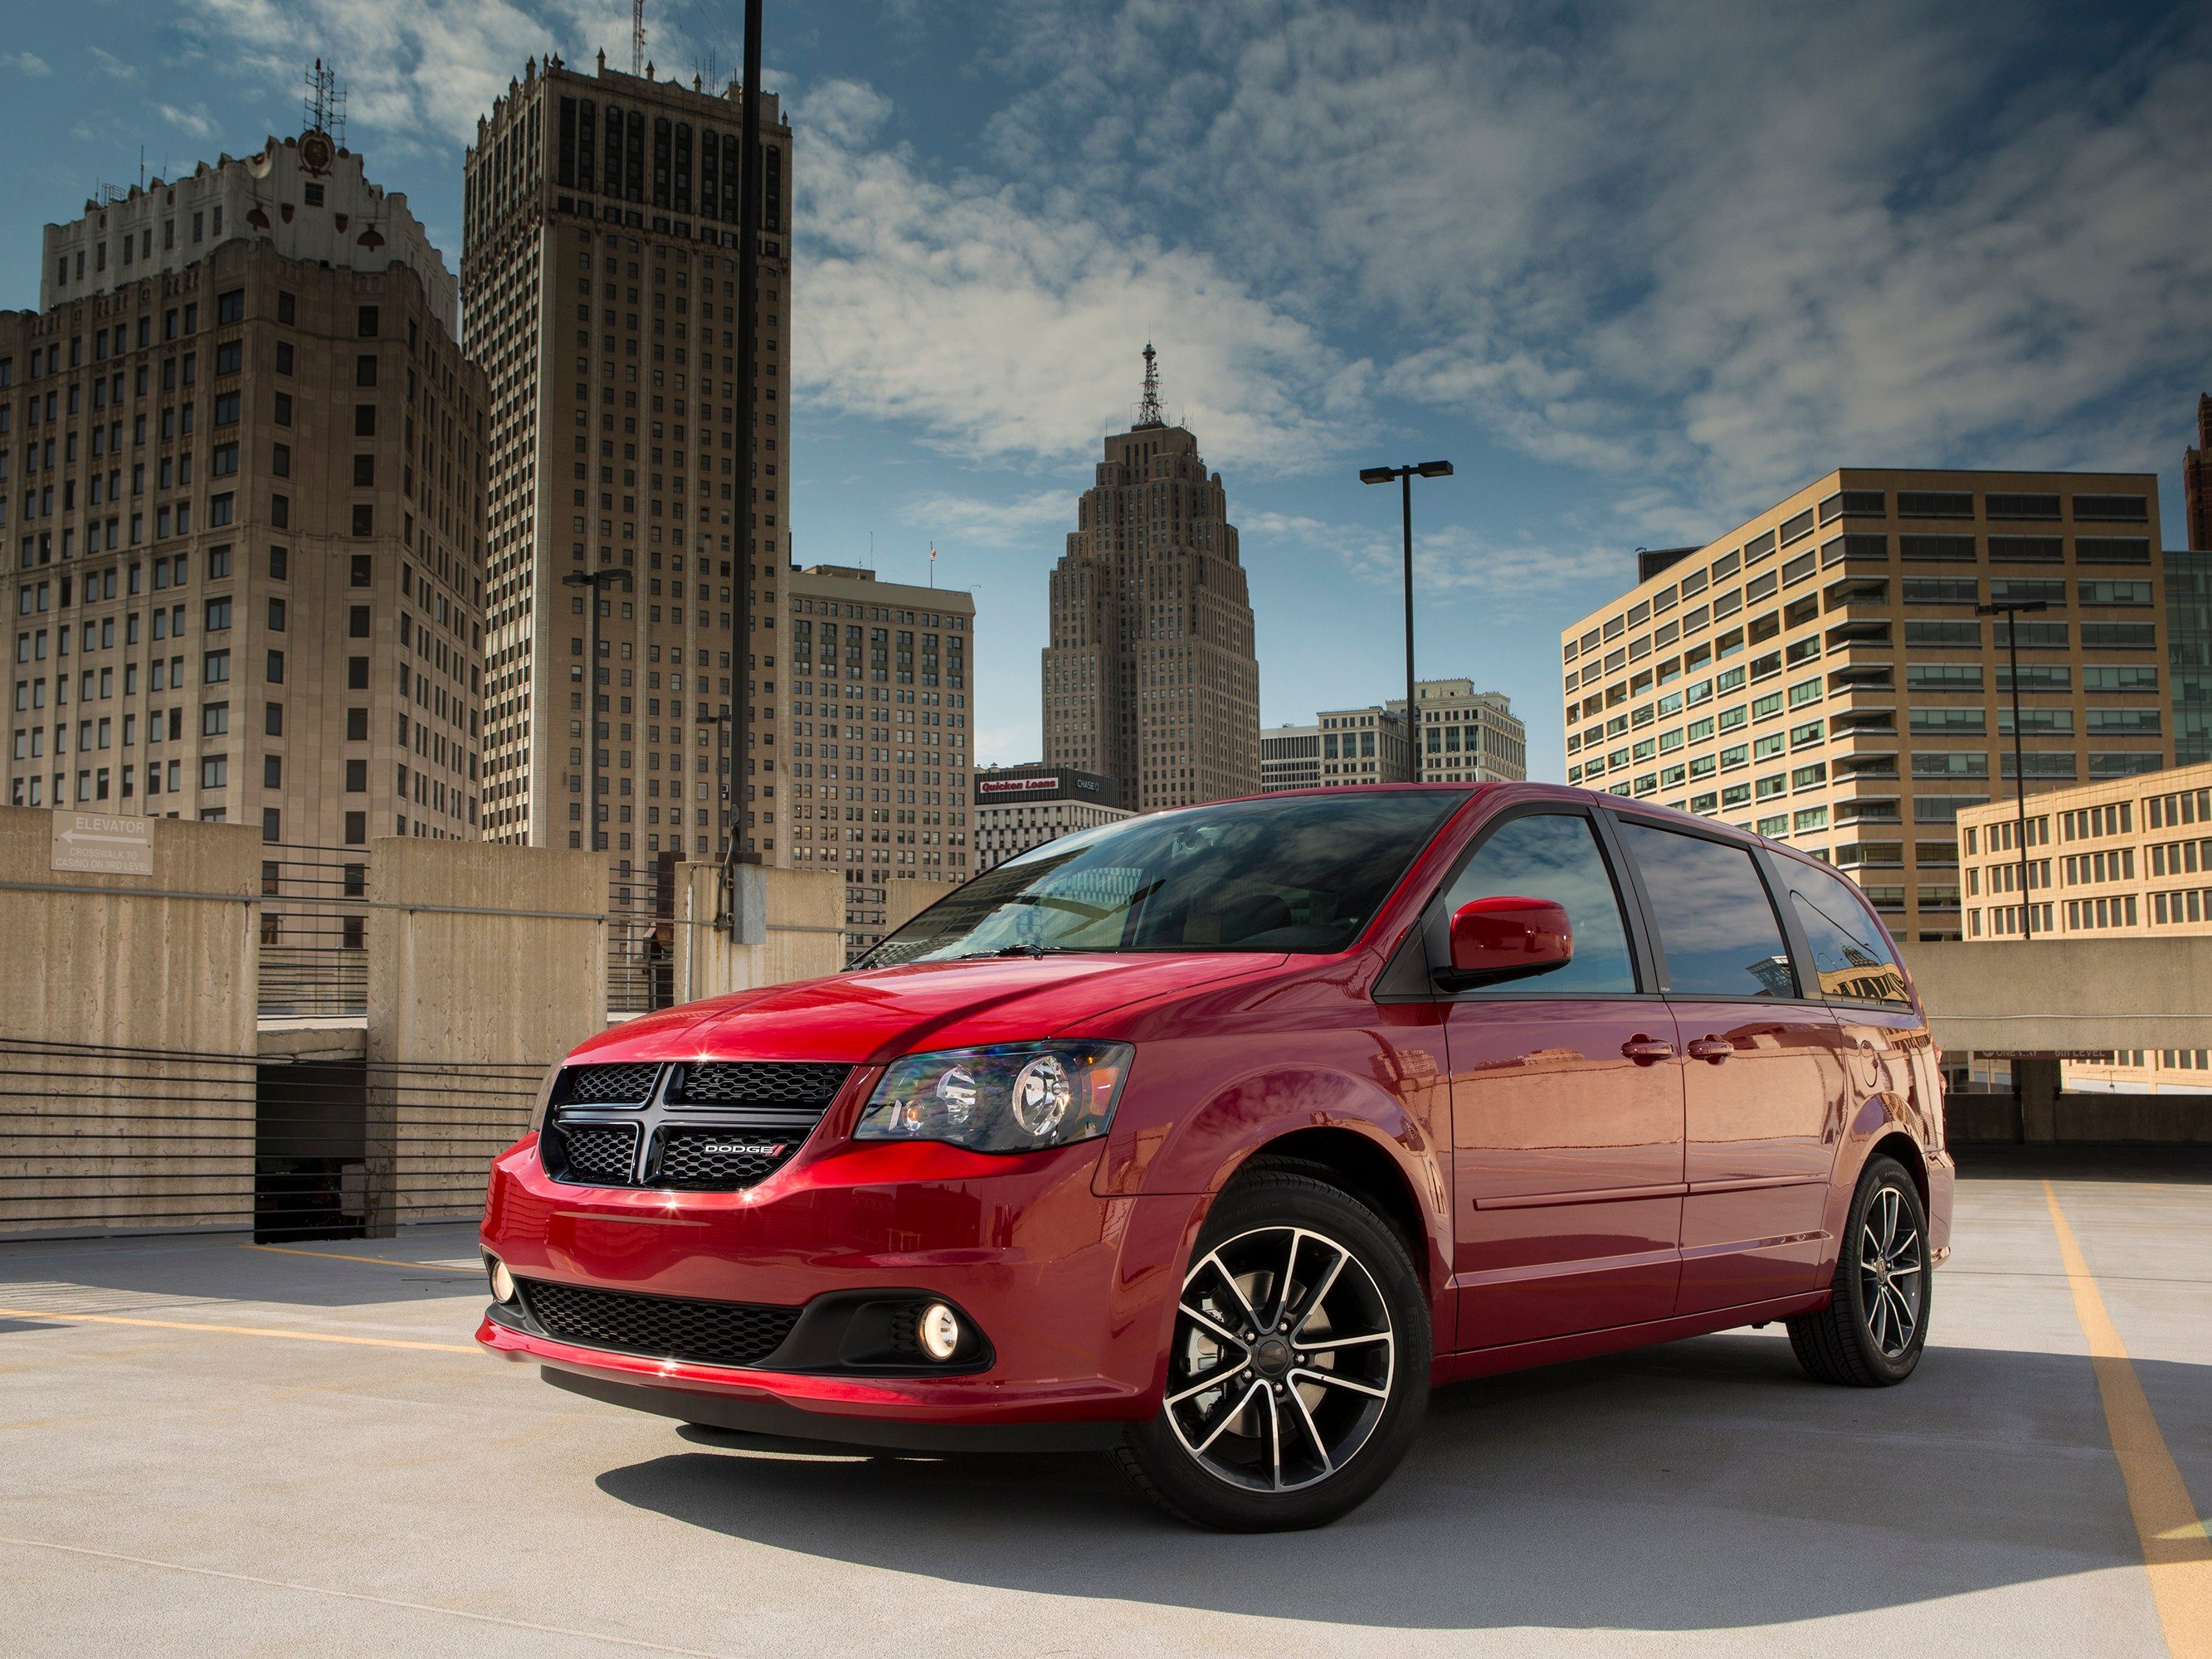 Introducing the 2016 Dodge Grand Caravan